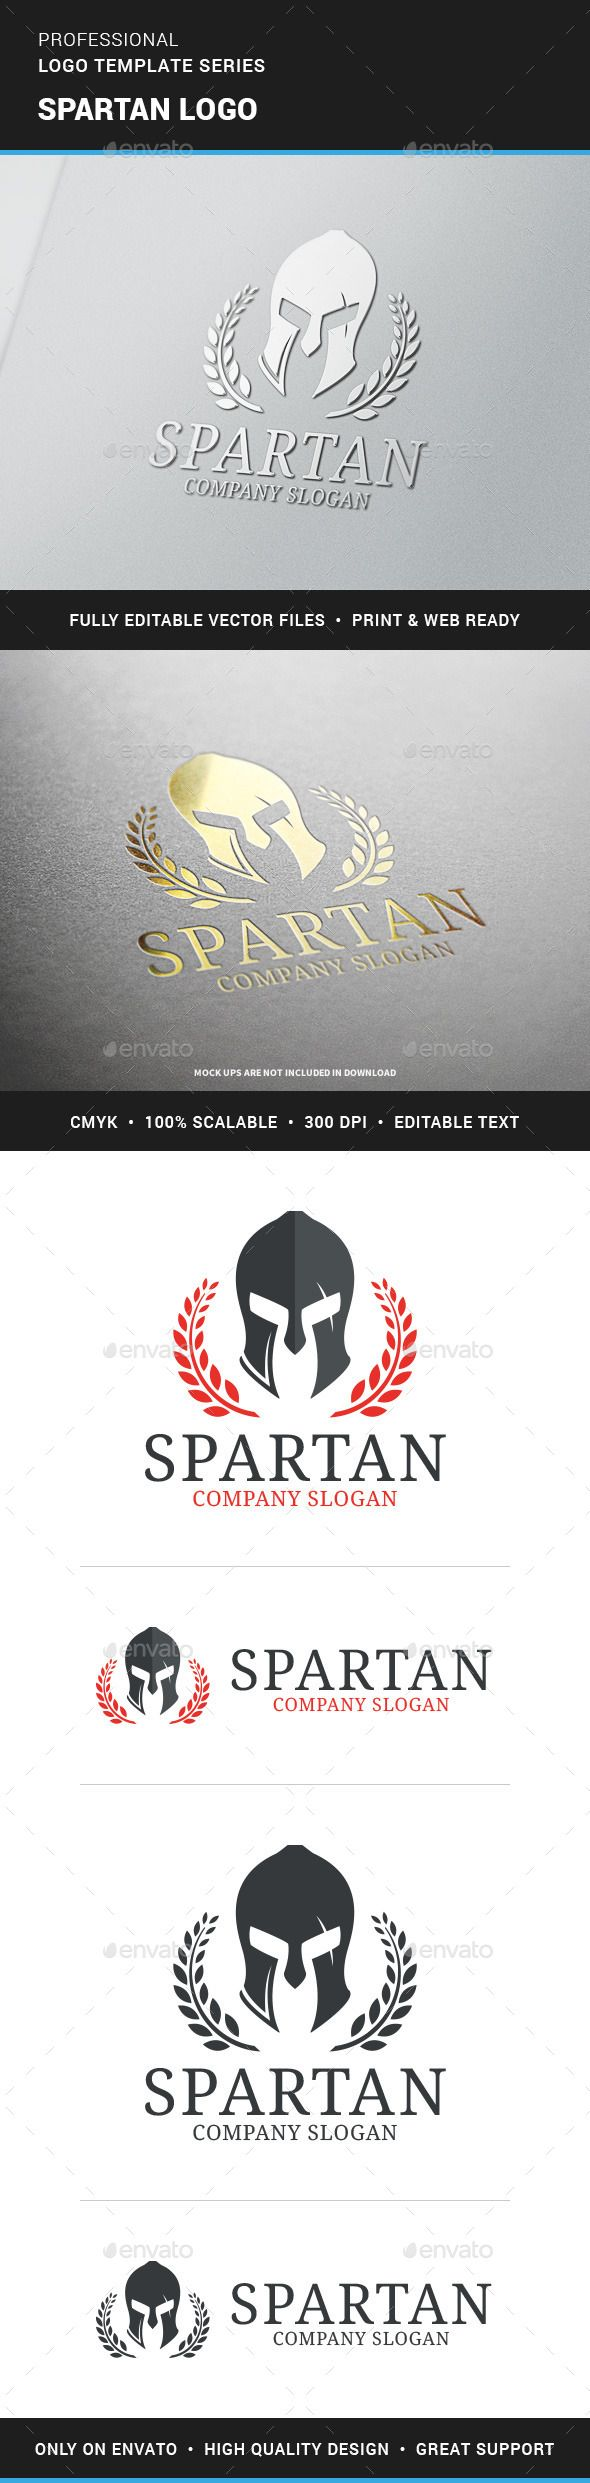 Spartan  - Logo Design Template Vector #logotype Download it here: http://graphicriver.net/item/spartan-logo-template/12438584?s_rank=965?ref=nexion